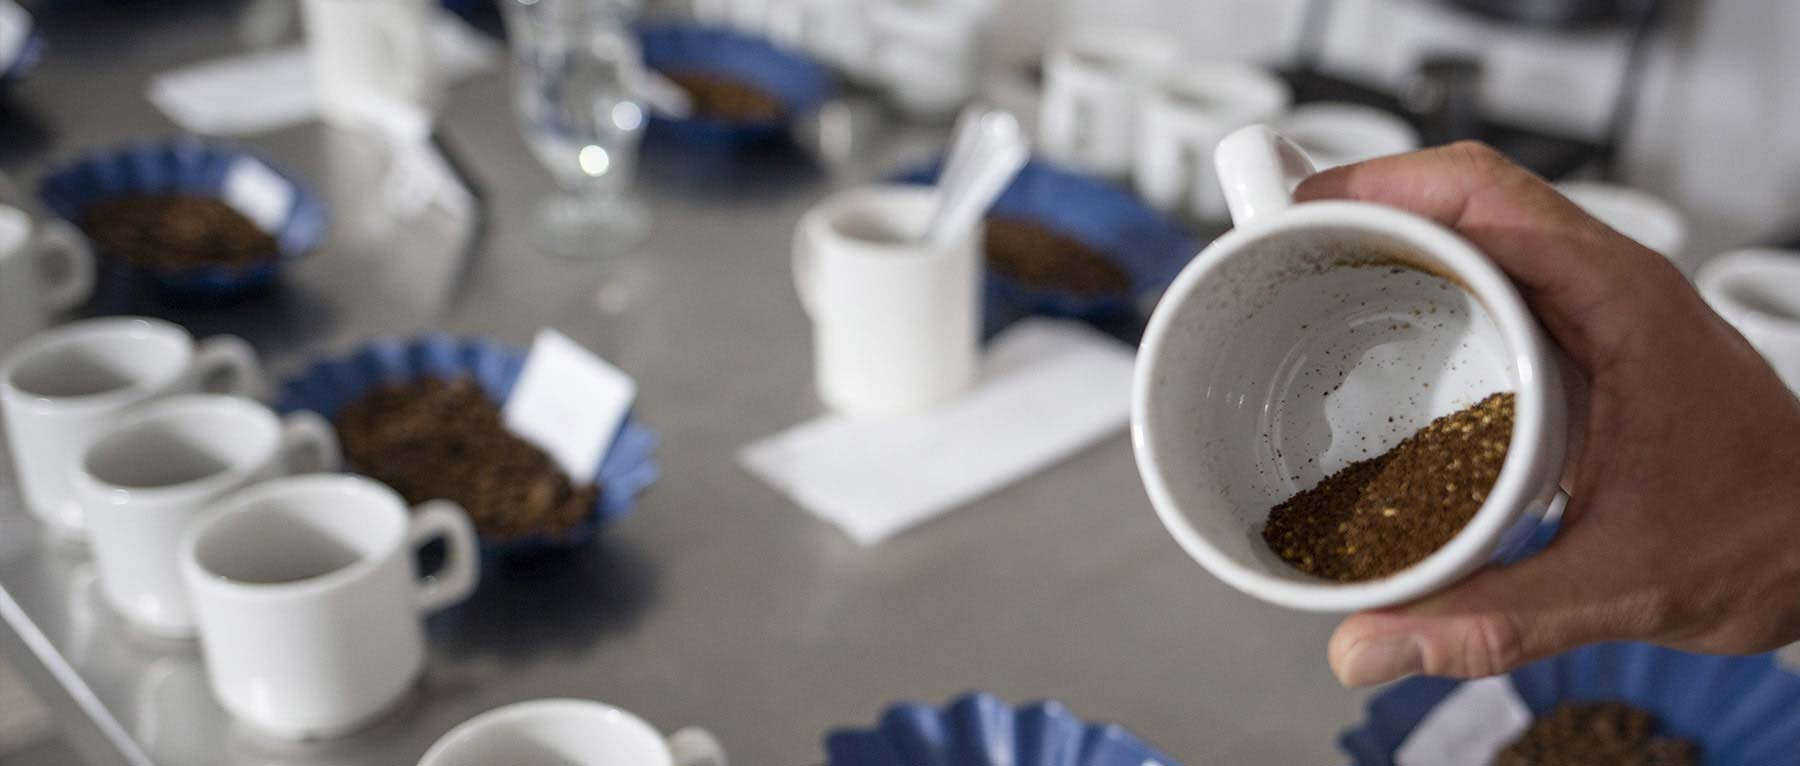 ACE - Alliance for Coffee Excellence. CafCaf.de – Kaffee & Blog, Kaffeeblog